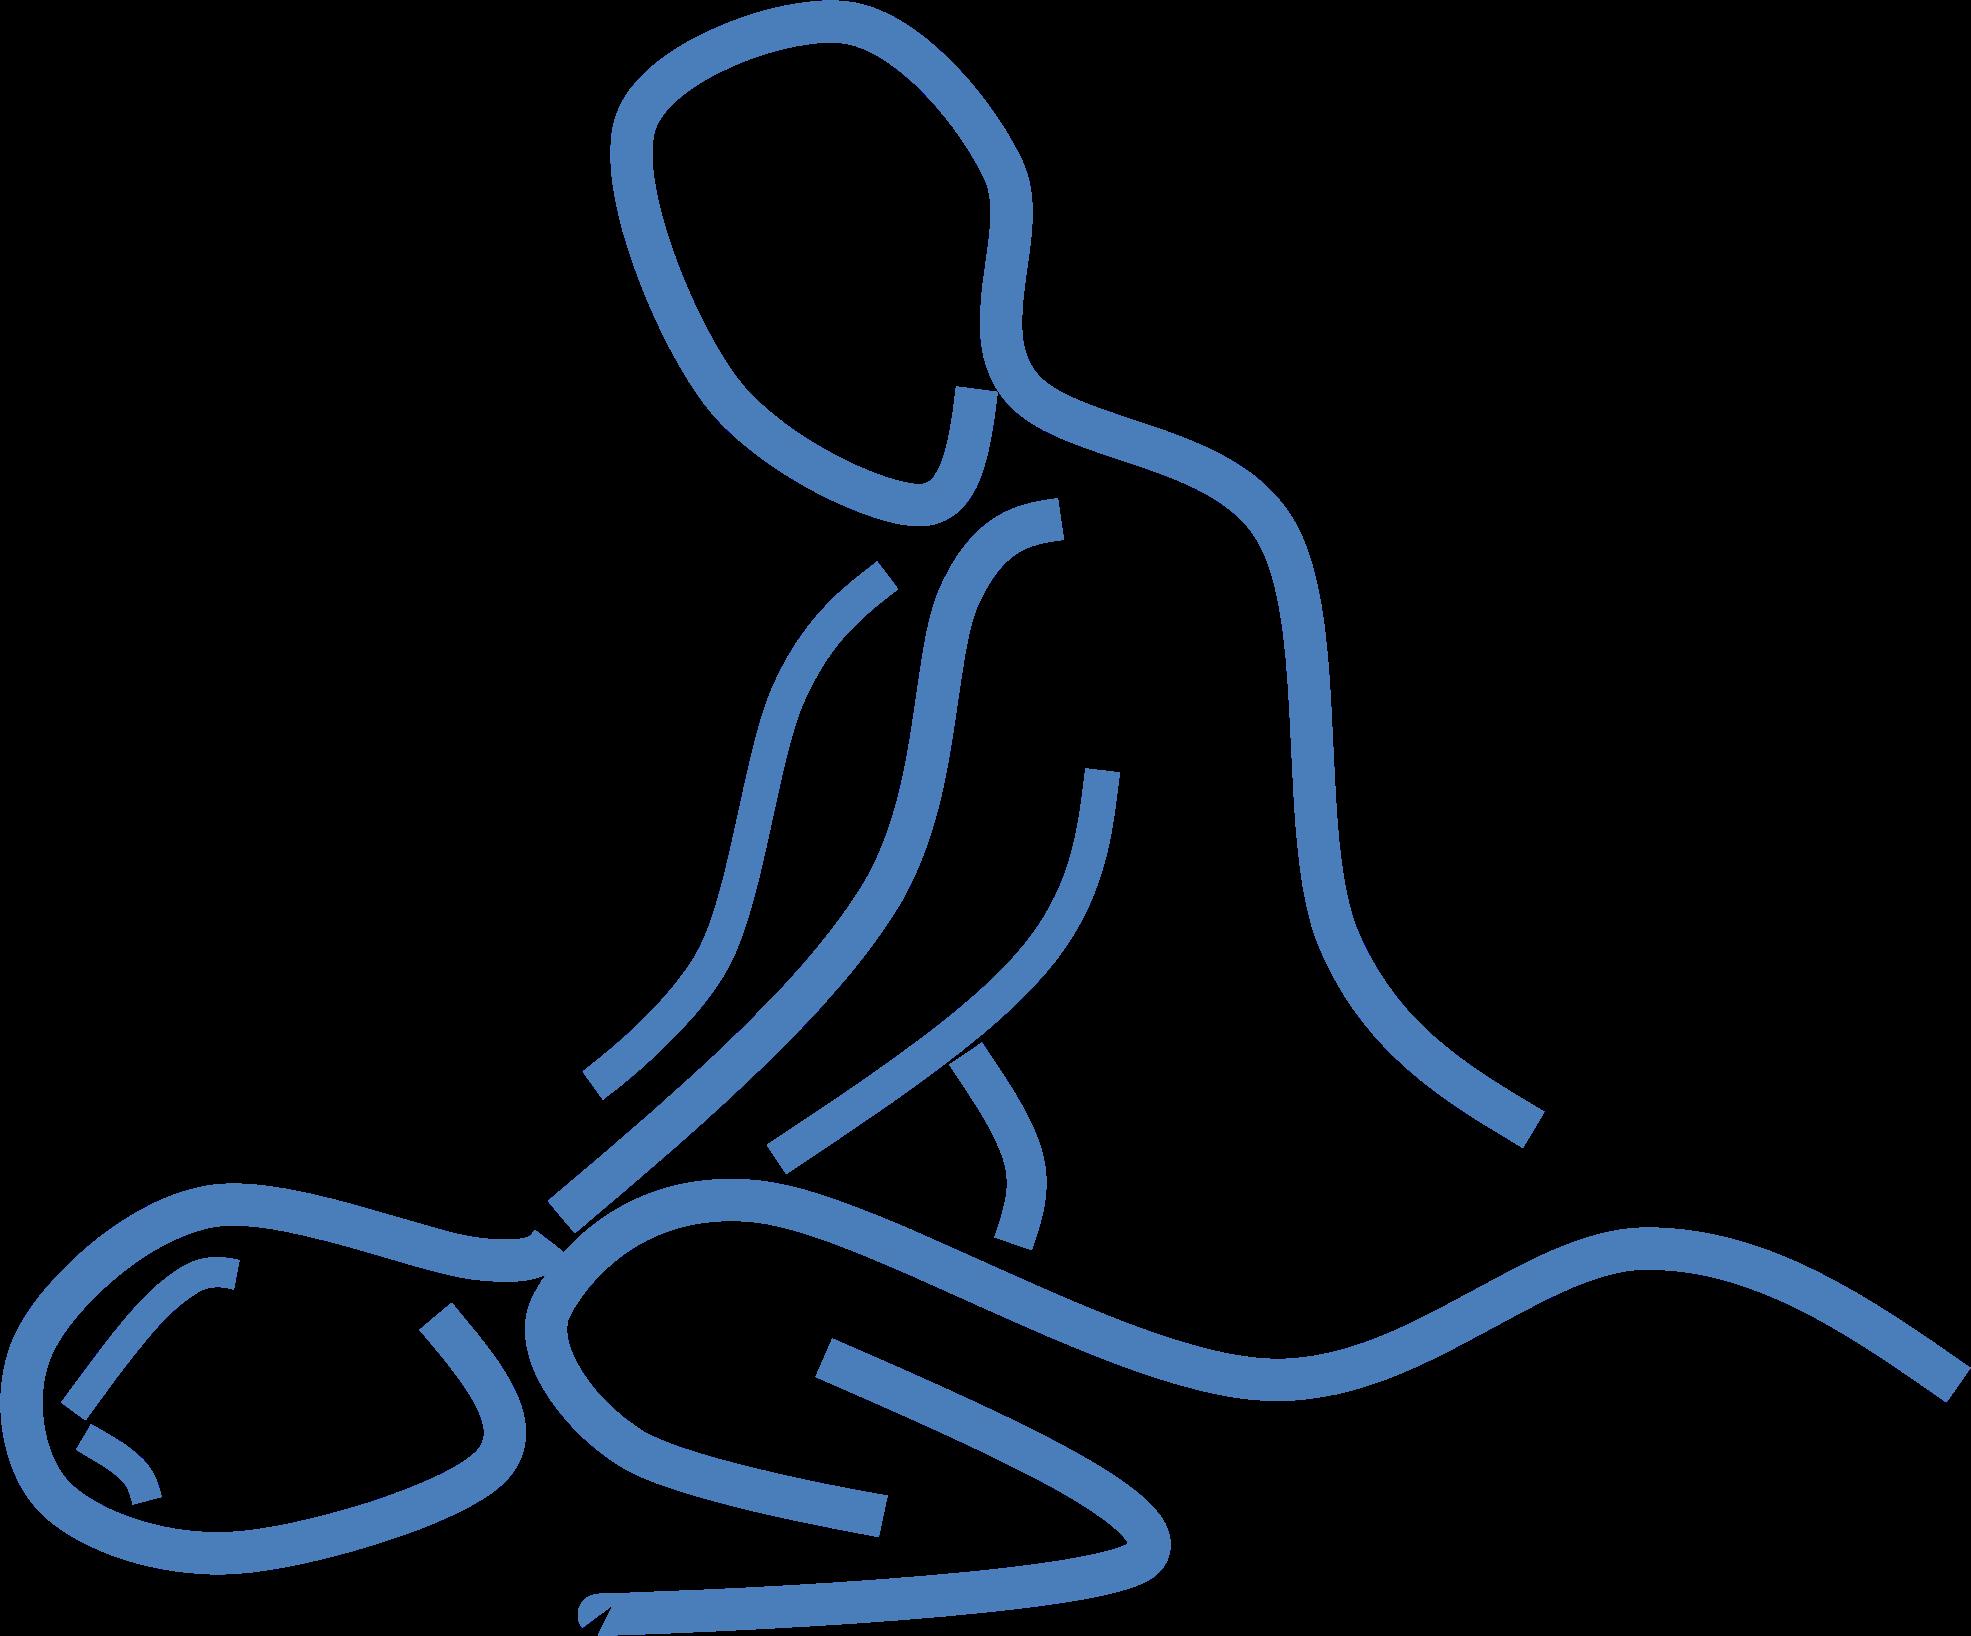 clip art royalty free download Free massage cliparts download. Massages clipart